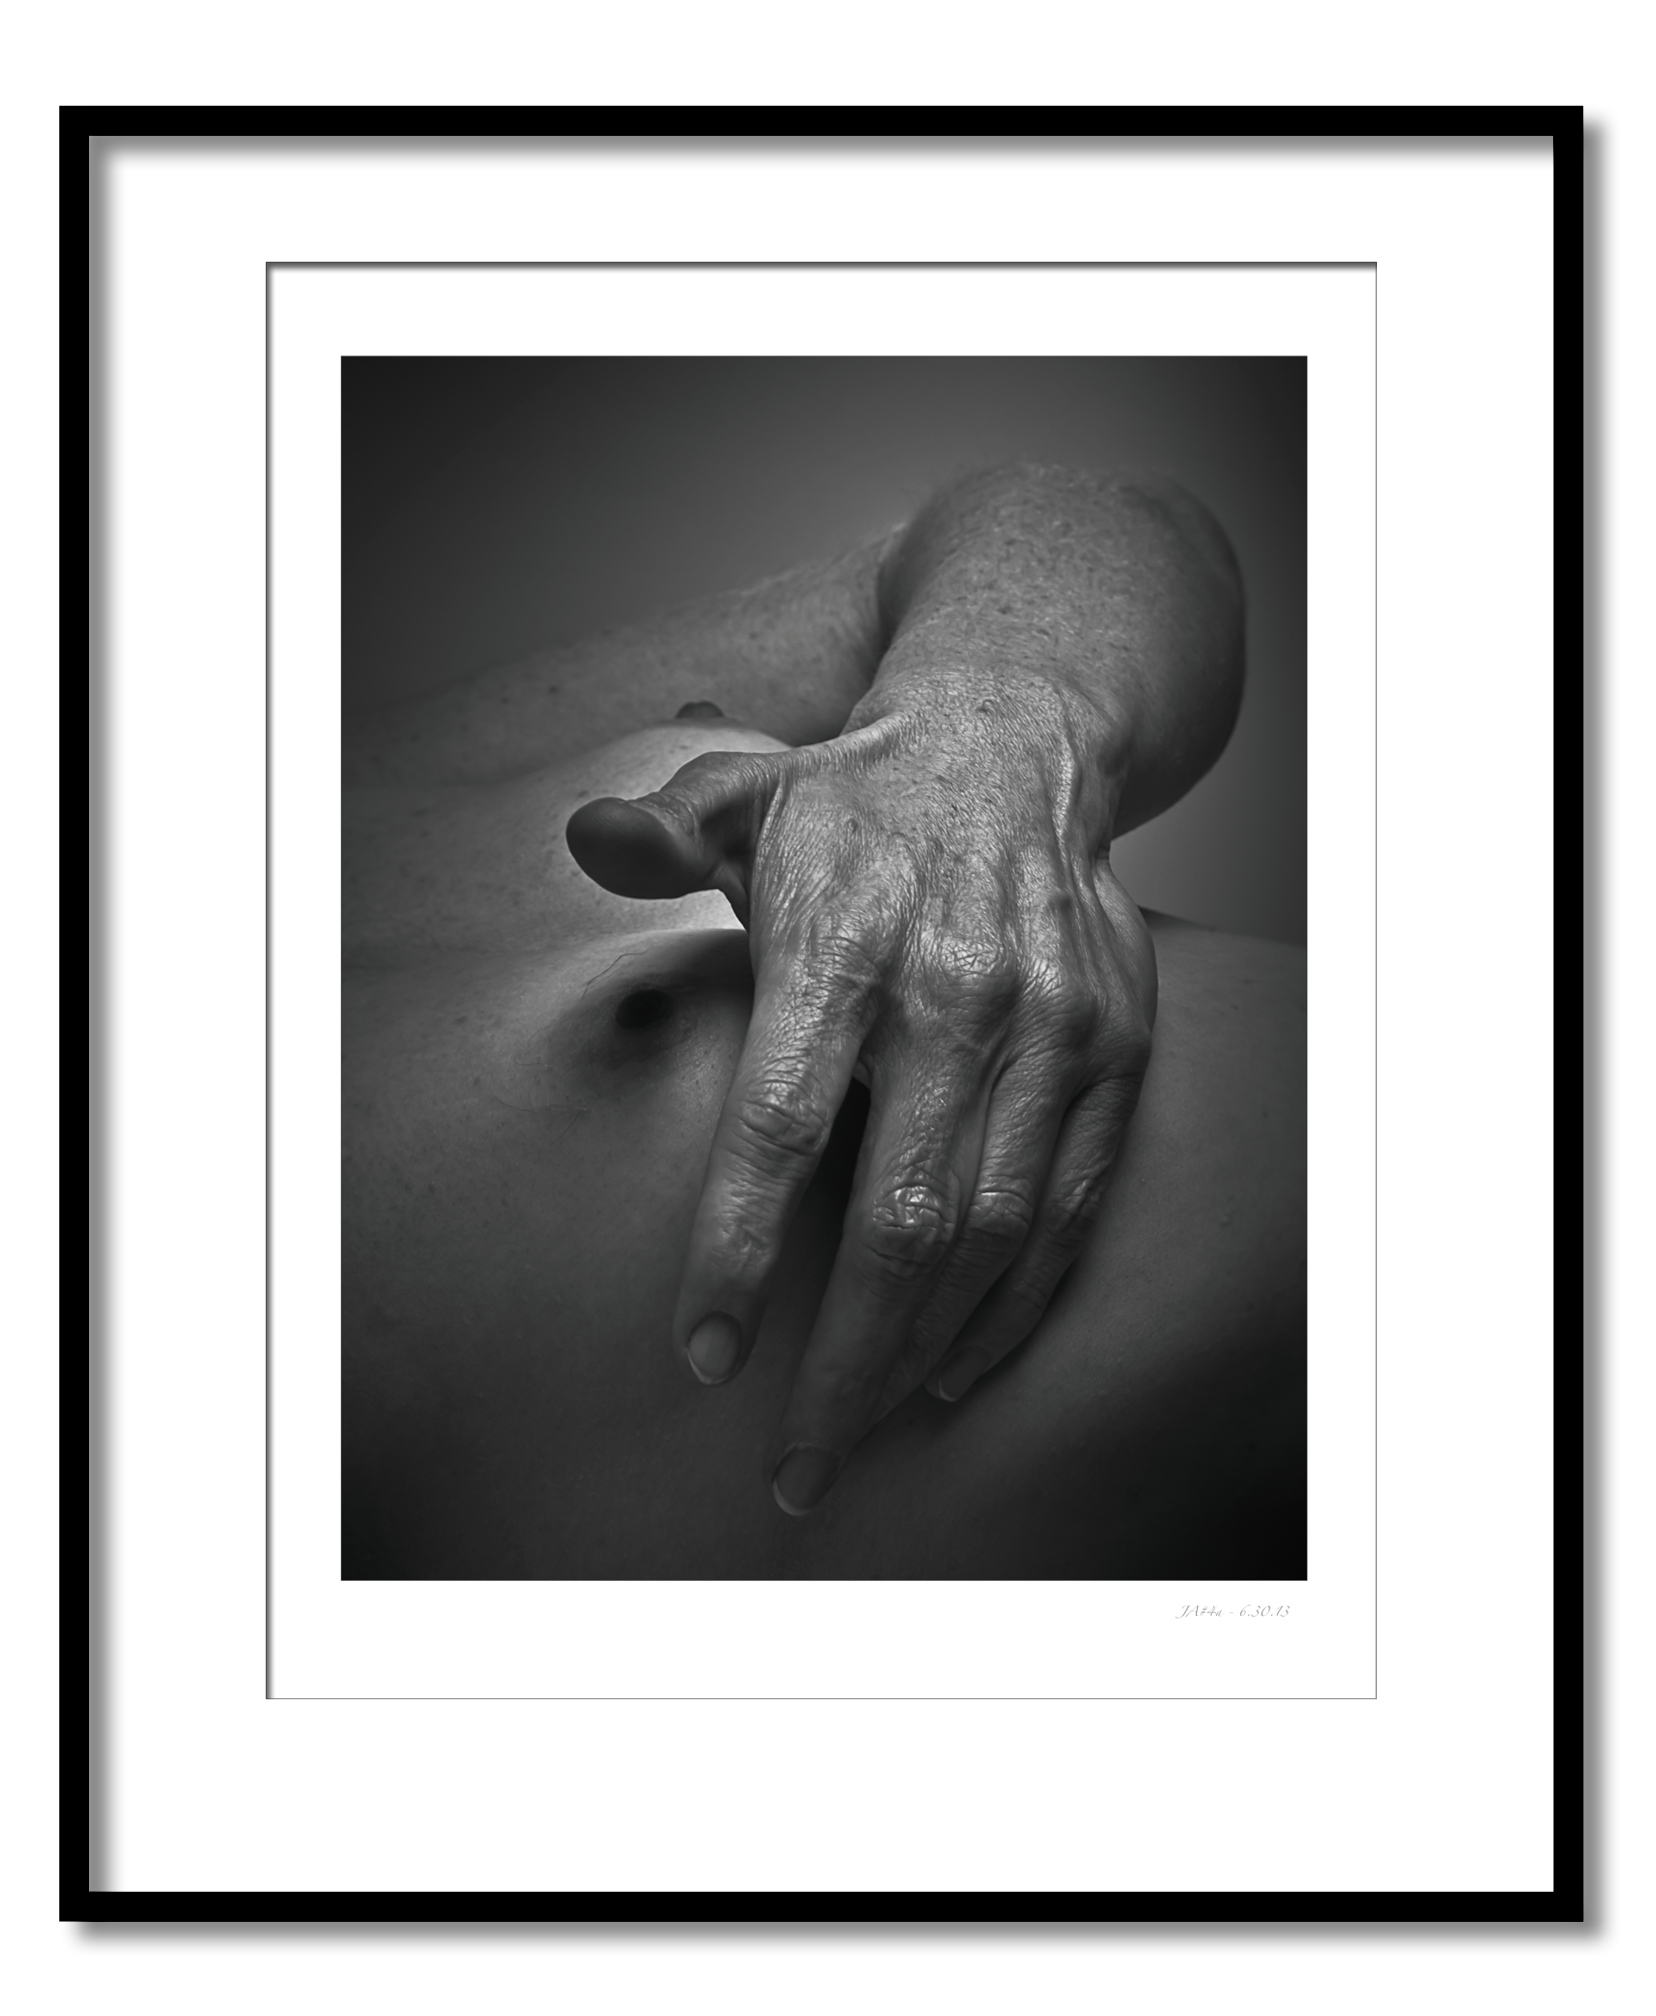 JA's Hand #4A - 6.30.13.jpg